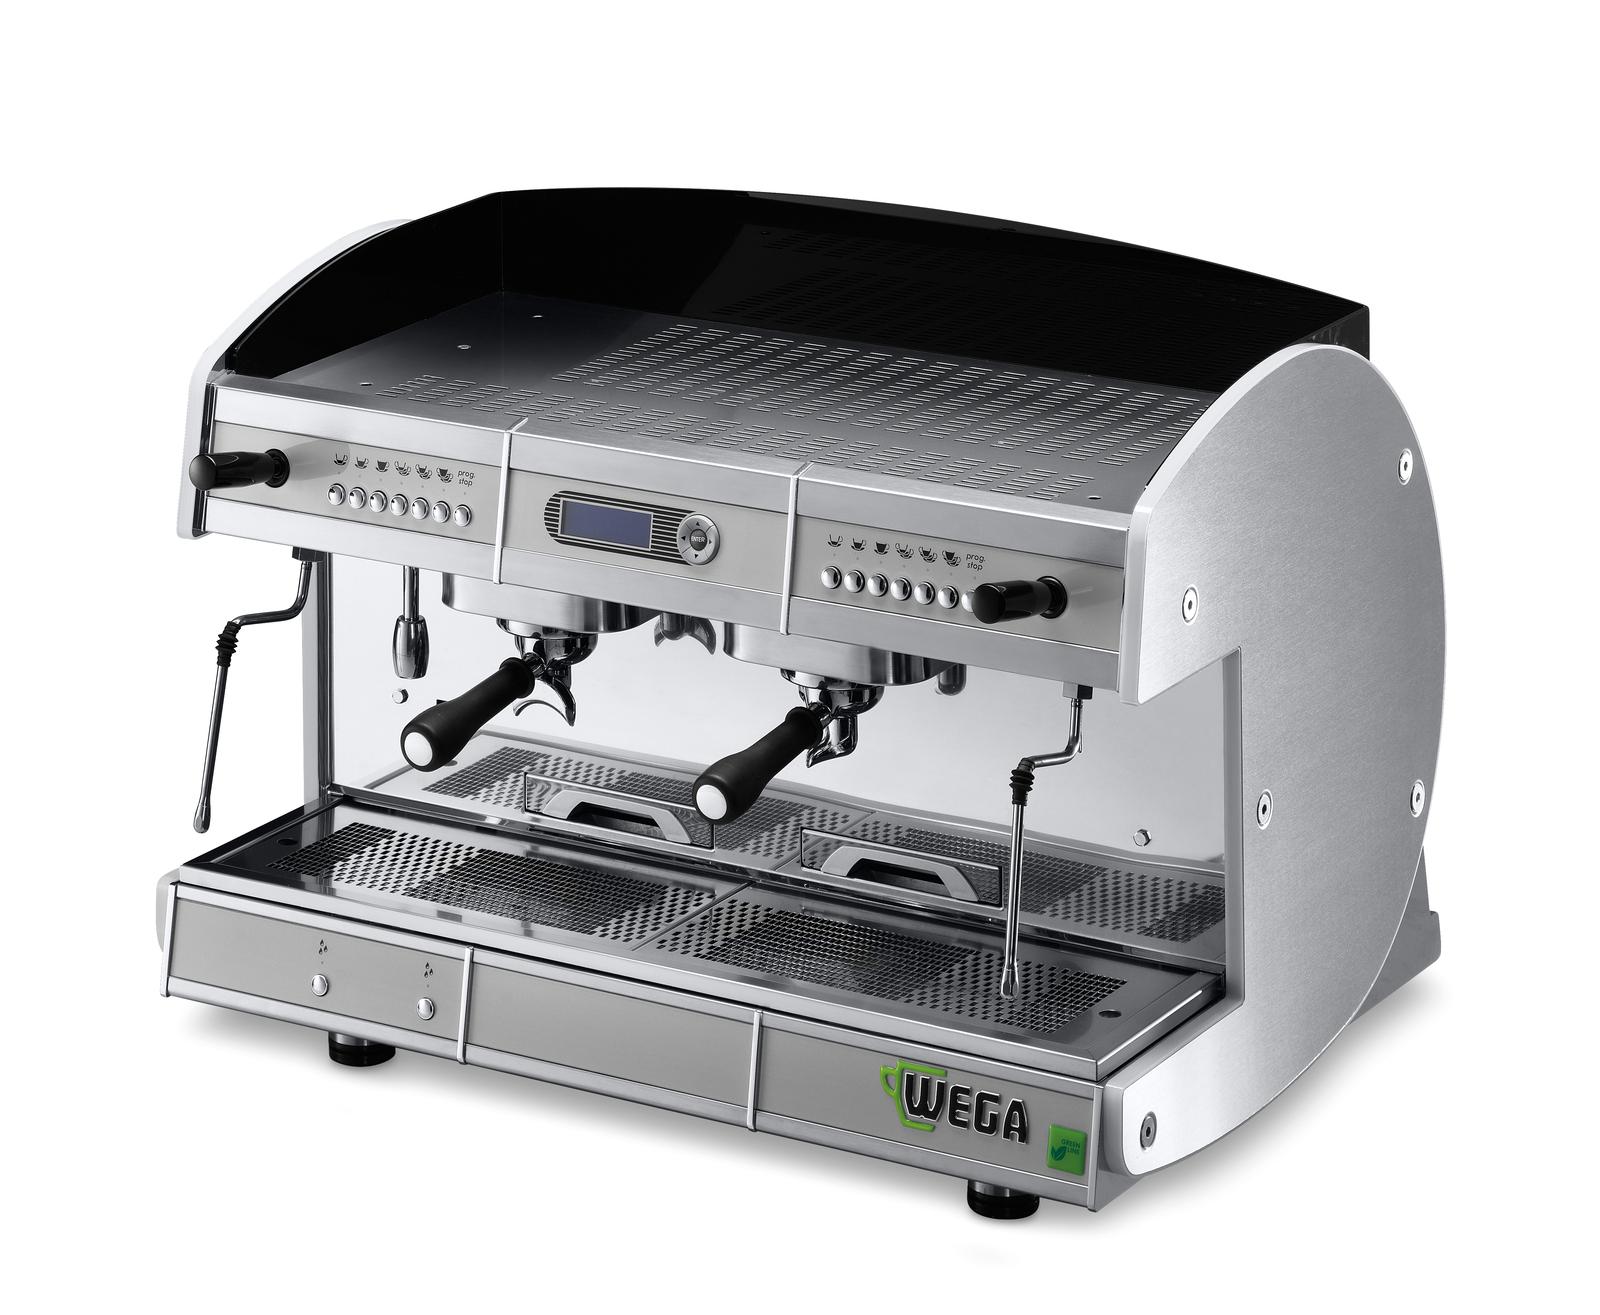 8216ed0118 Wega Concept – Coffee Beanery